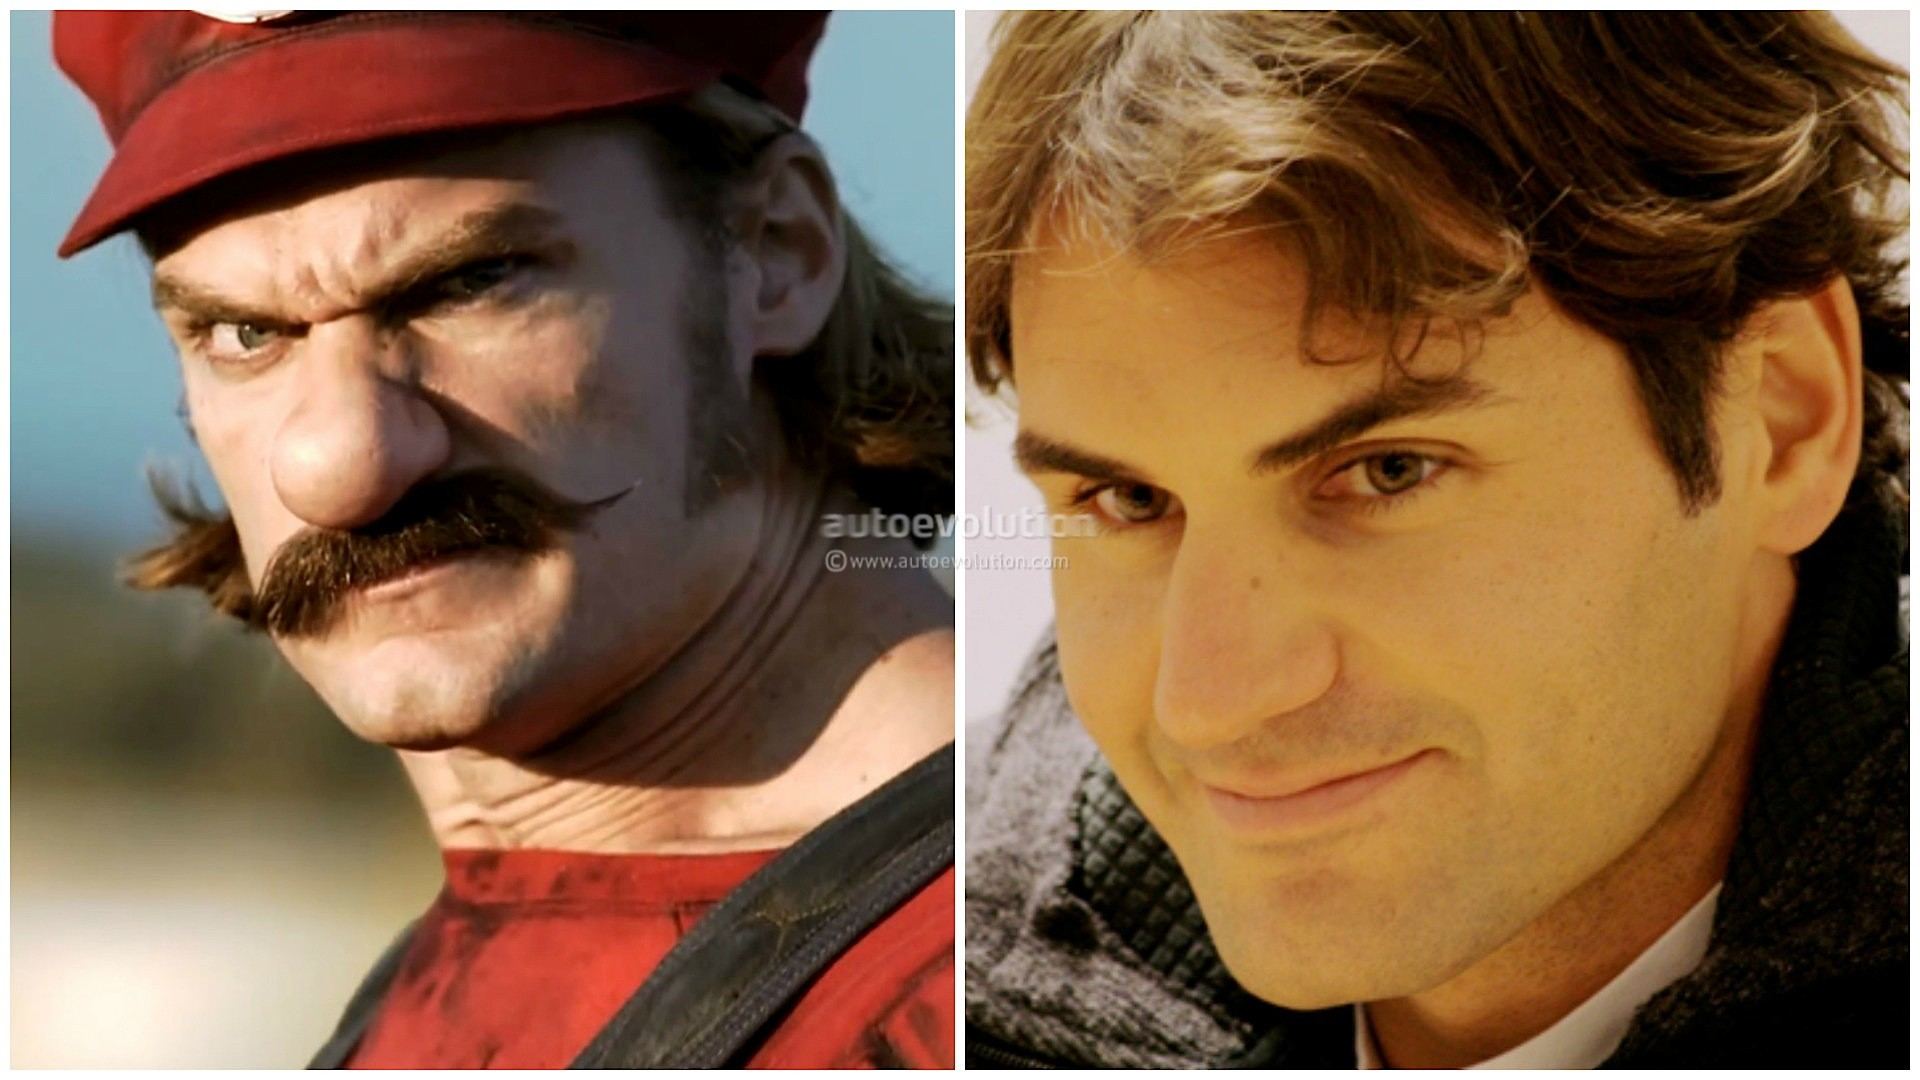 Roger Federer and Novak Djokovic Played Mario and Luigi in